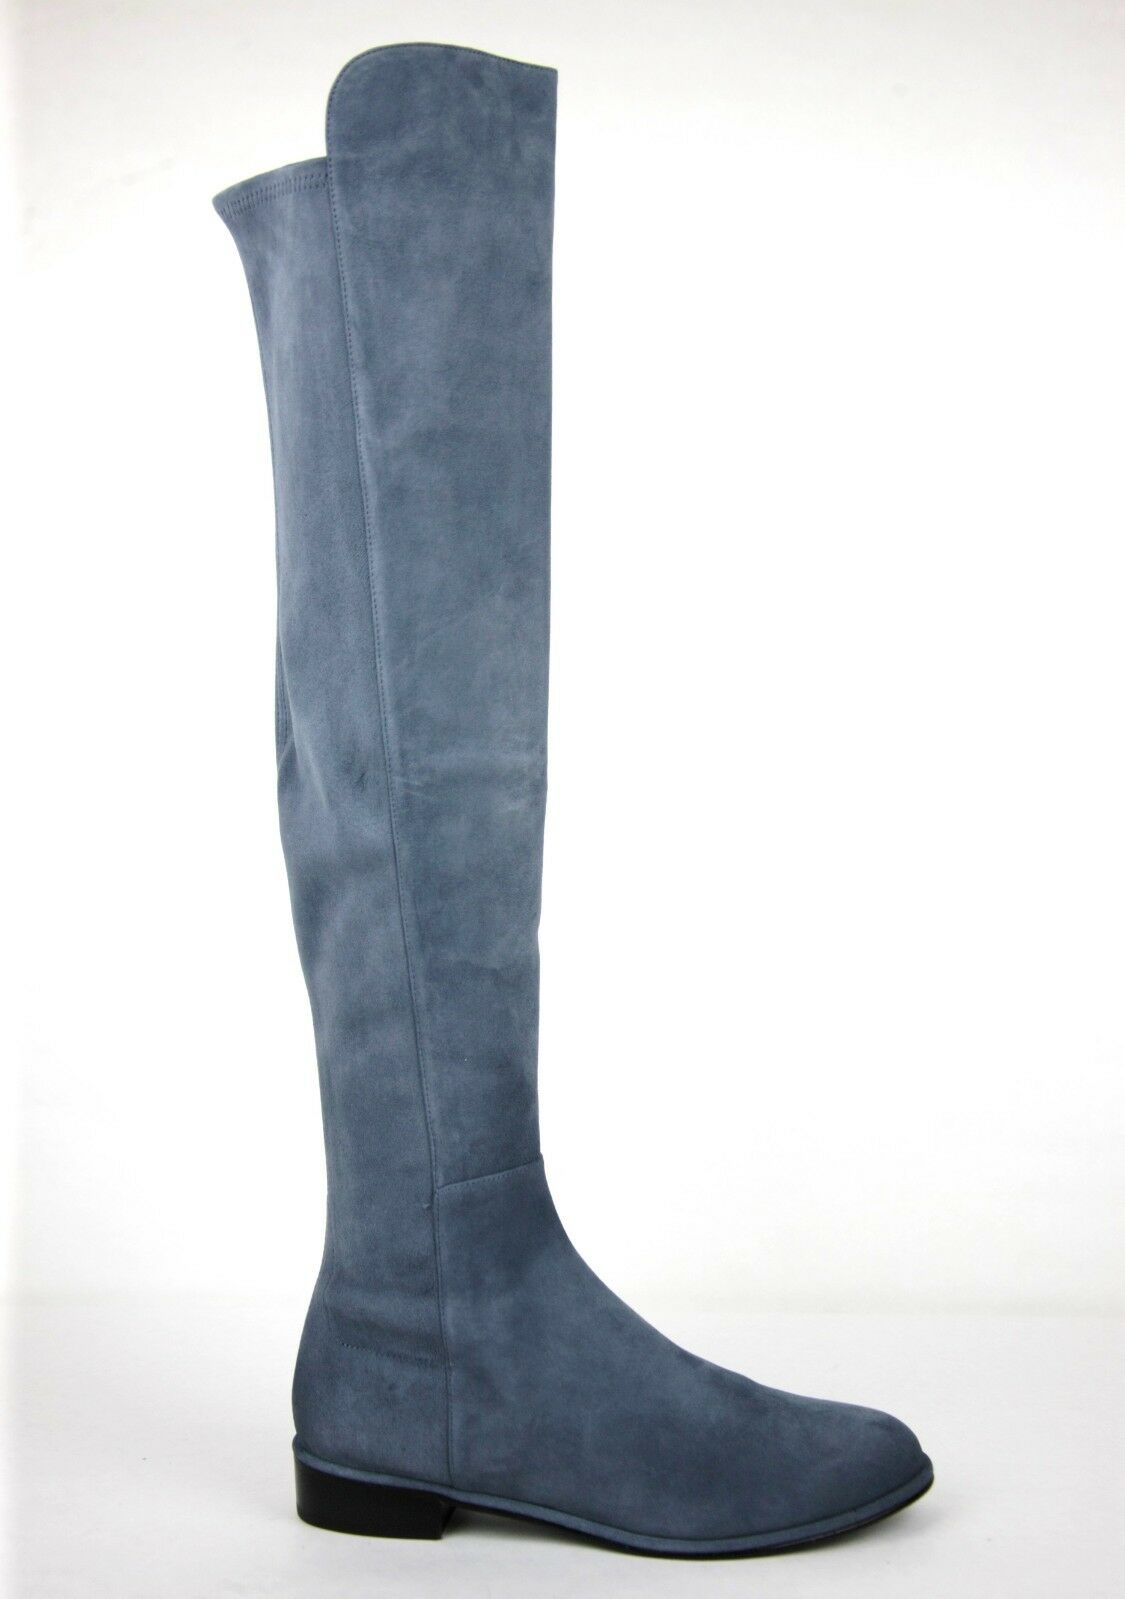 765 New Stuart Weitzman Denim Suede Allgood Allgood Allgood Low Heel Knee Stiefel 2249c1